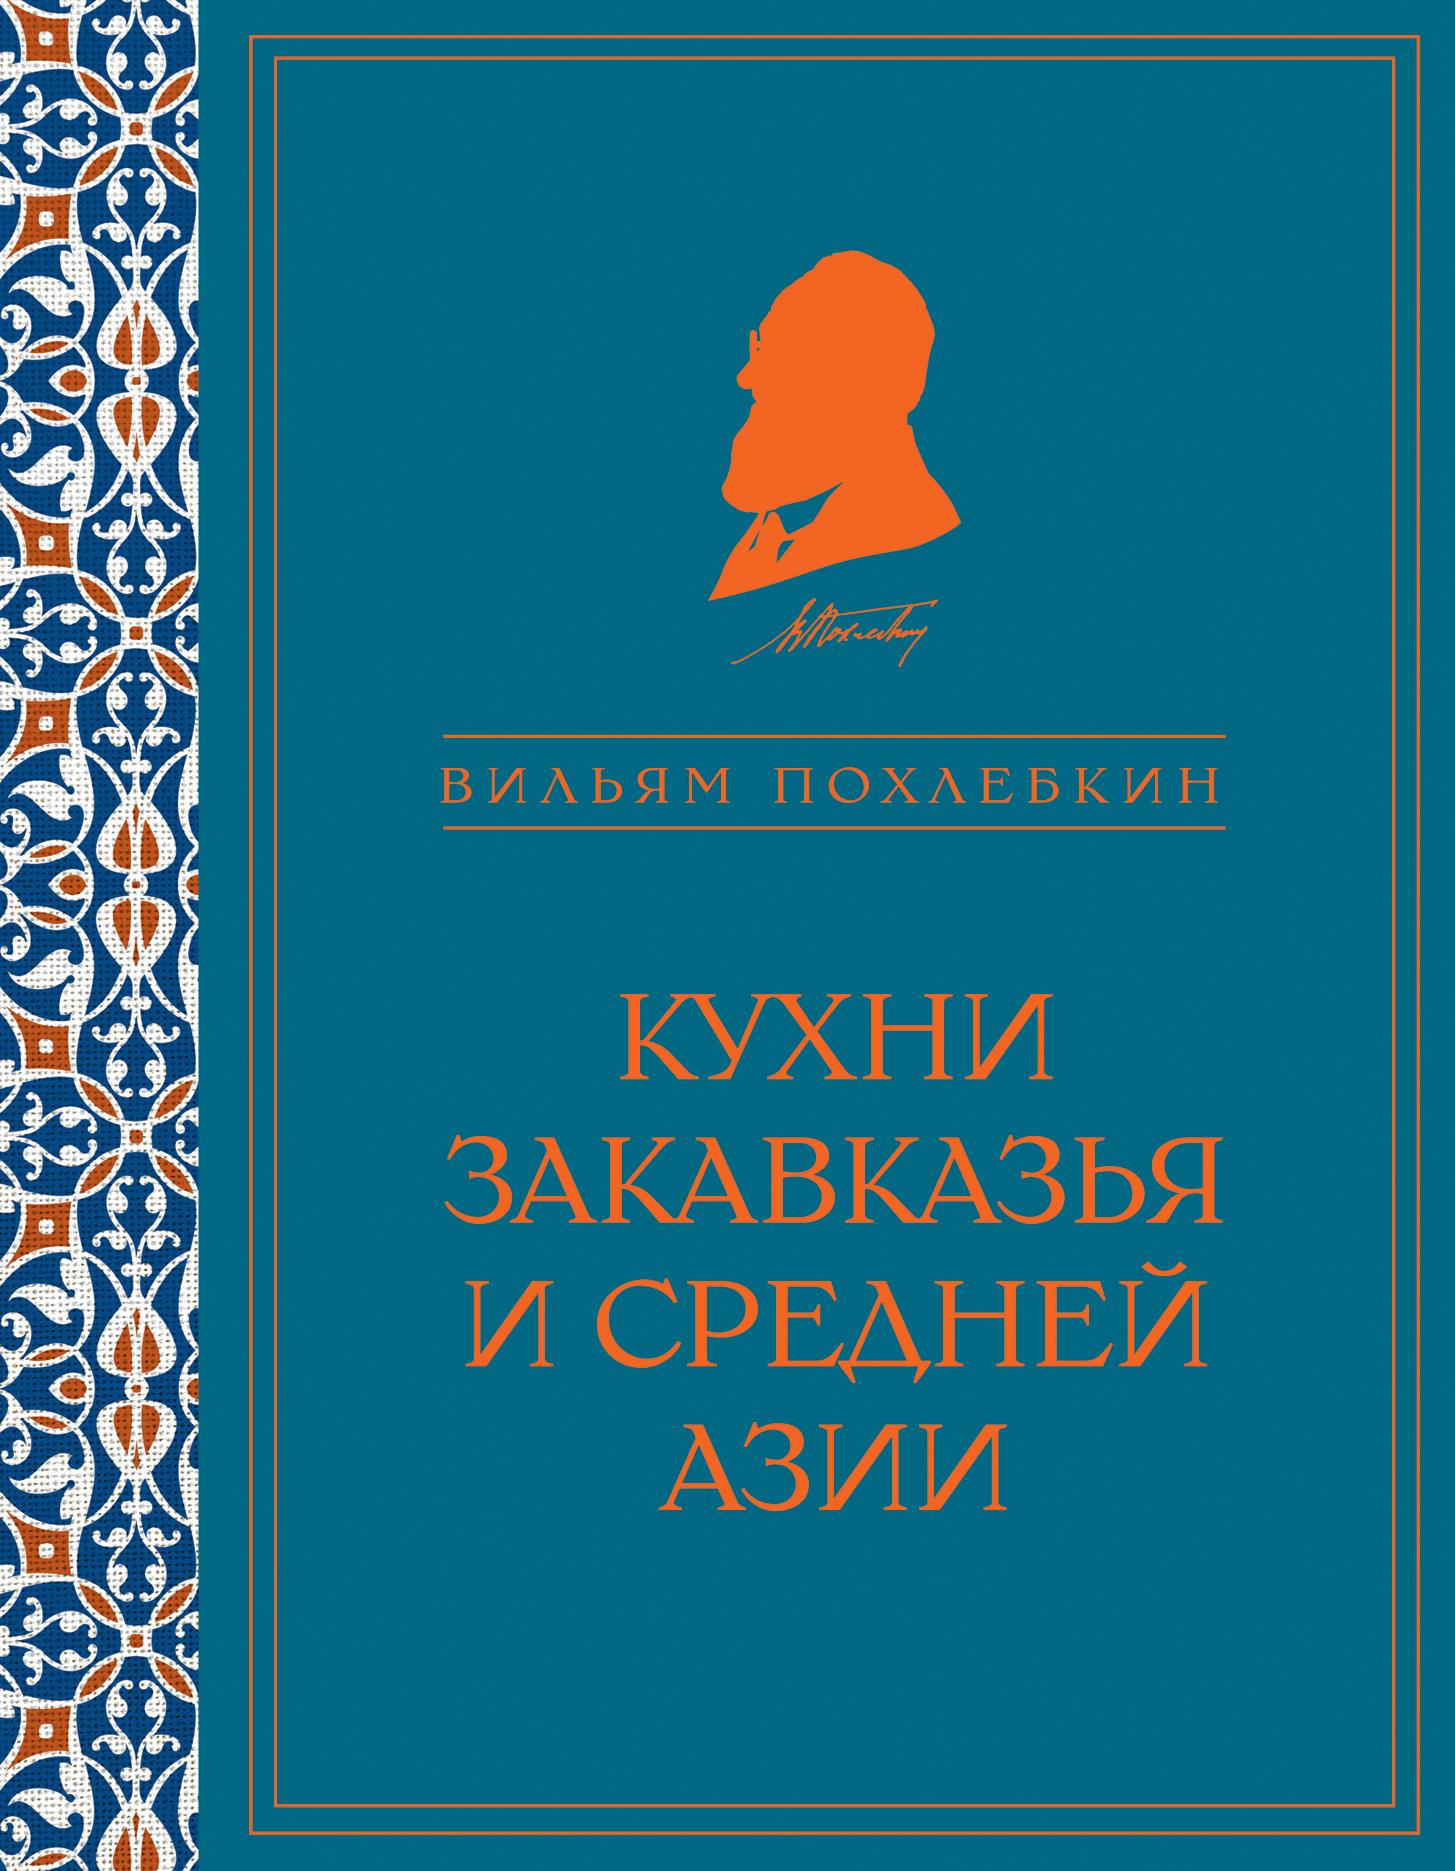 Кухни Закавказья и Средней Азии